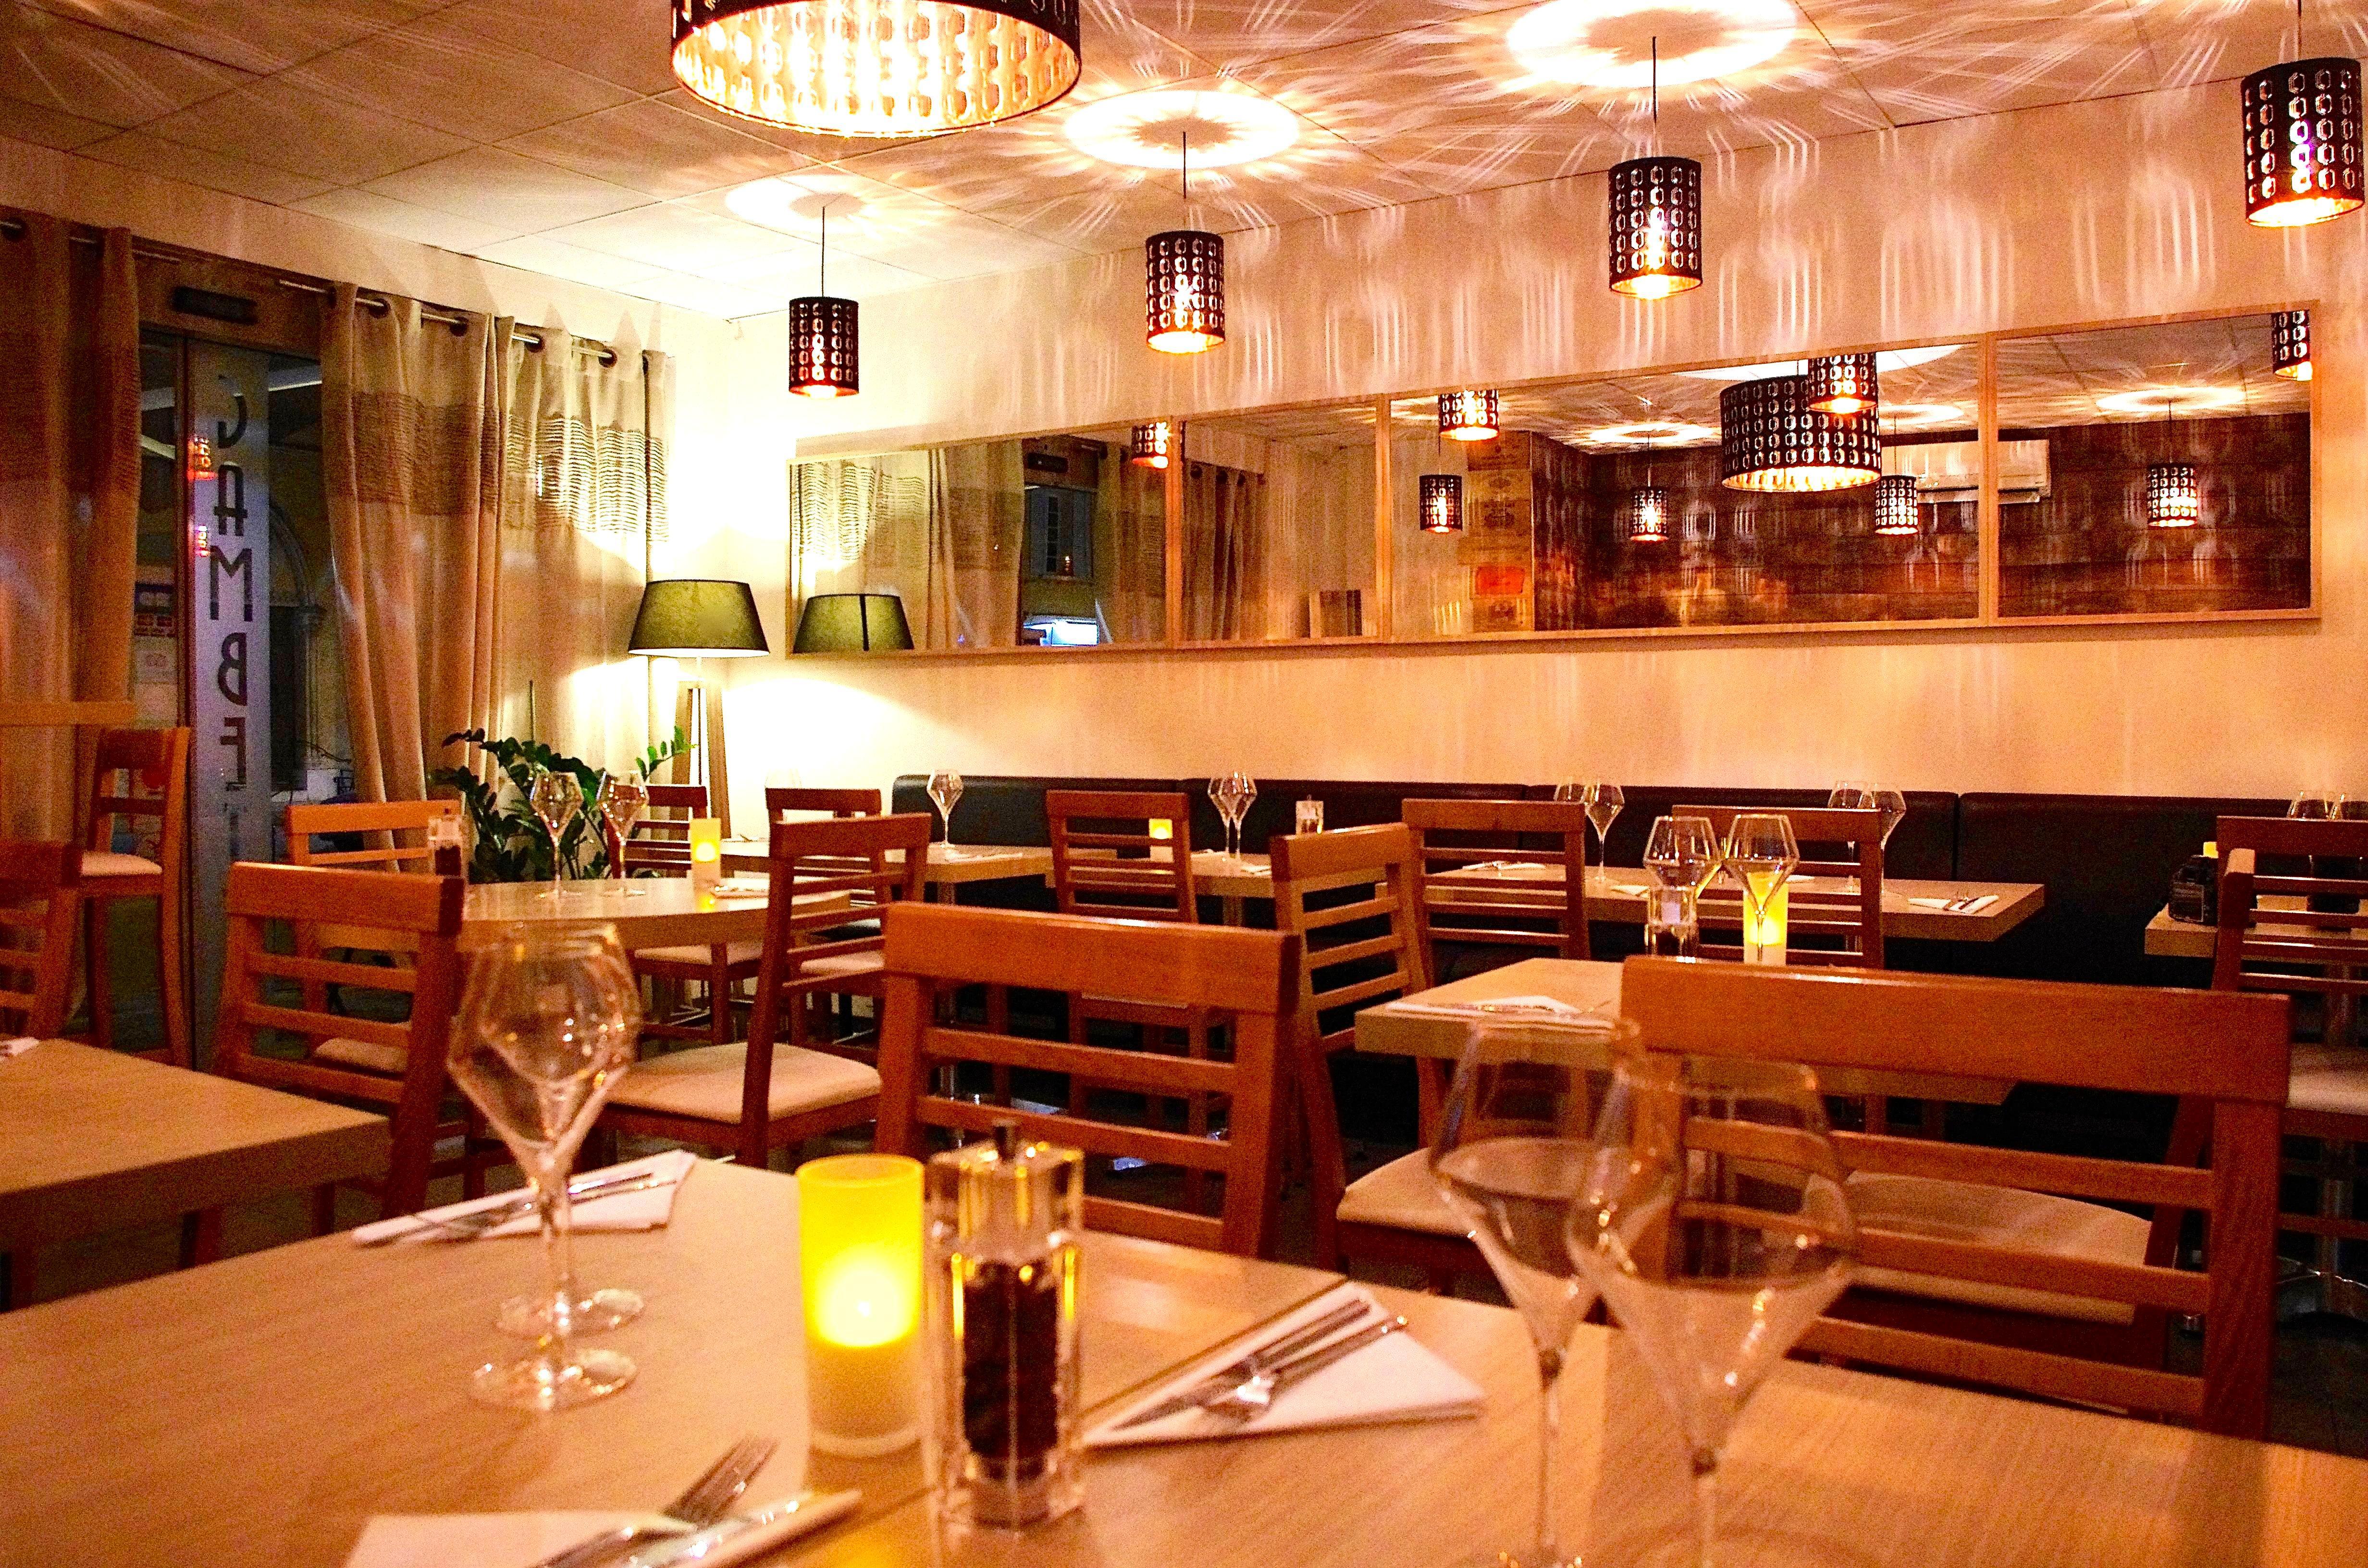 Aix-en-Provence,  Food Guide: 3 Fusion food Must-Eat Restaurants & Street Food Stalls in Les Milles